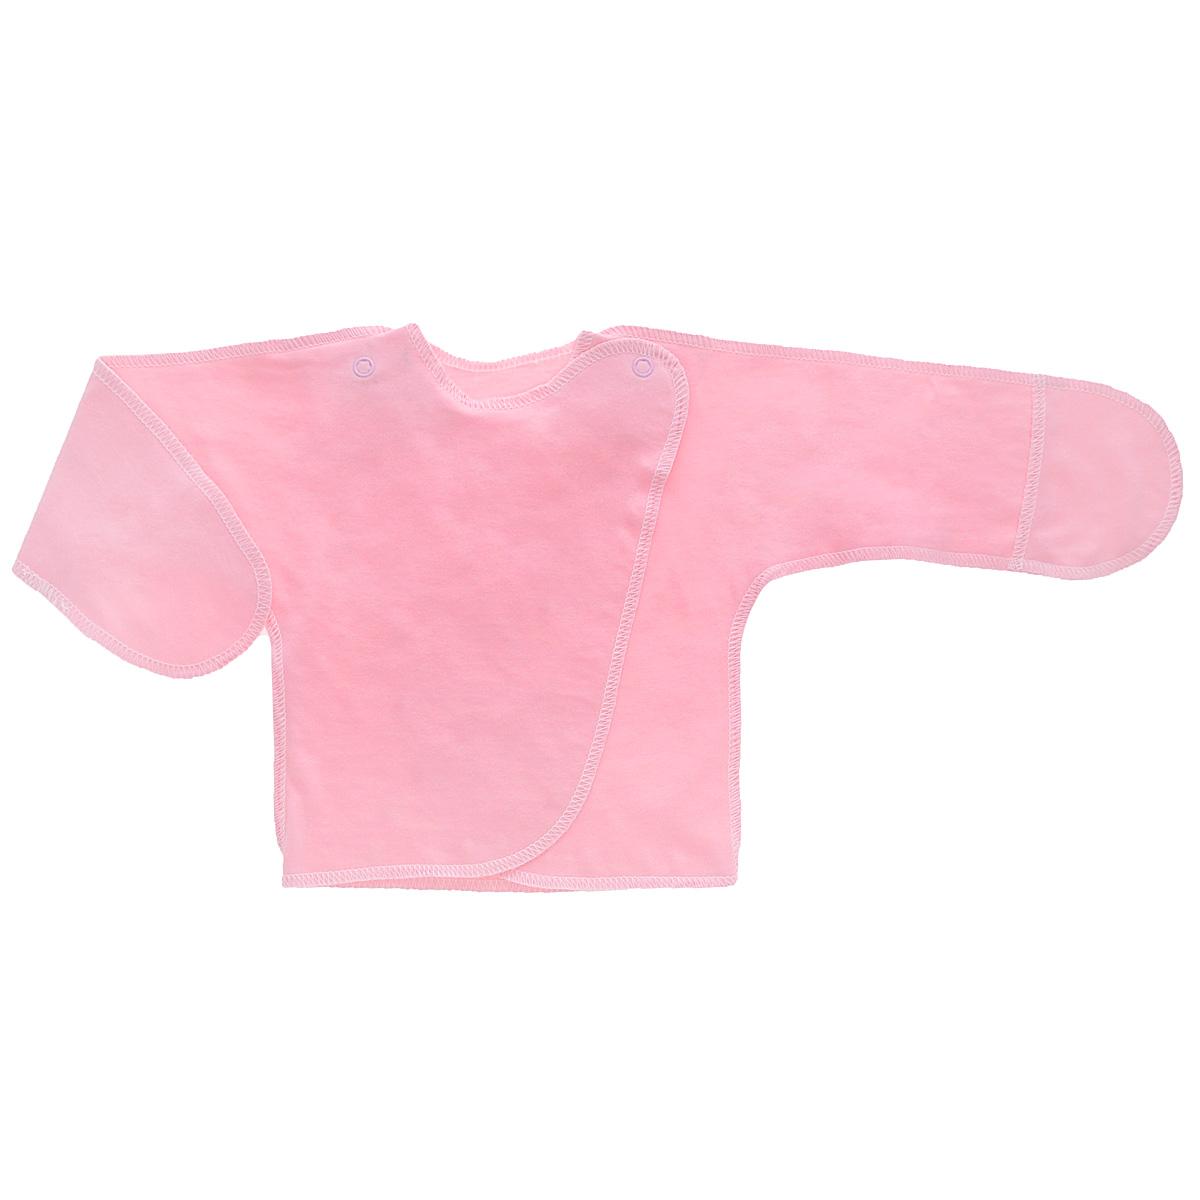 Распашонка Трон-плюс, цвет: розовый. 5003. Размер 68, 6 месяцев